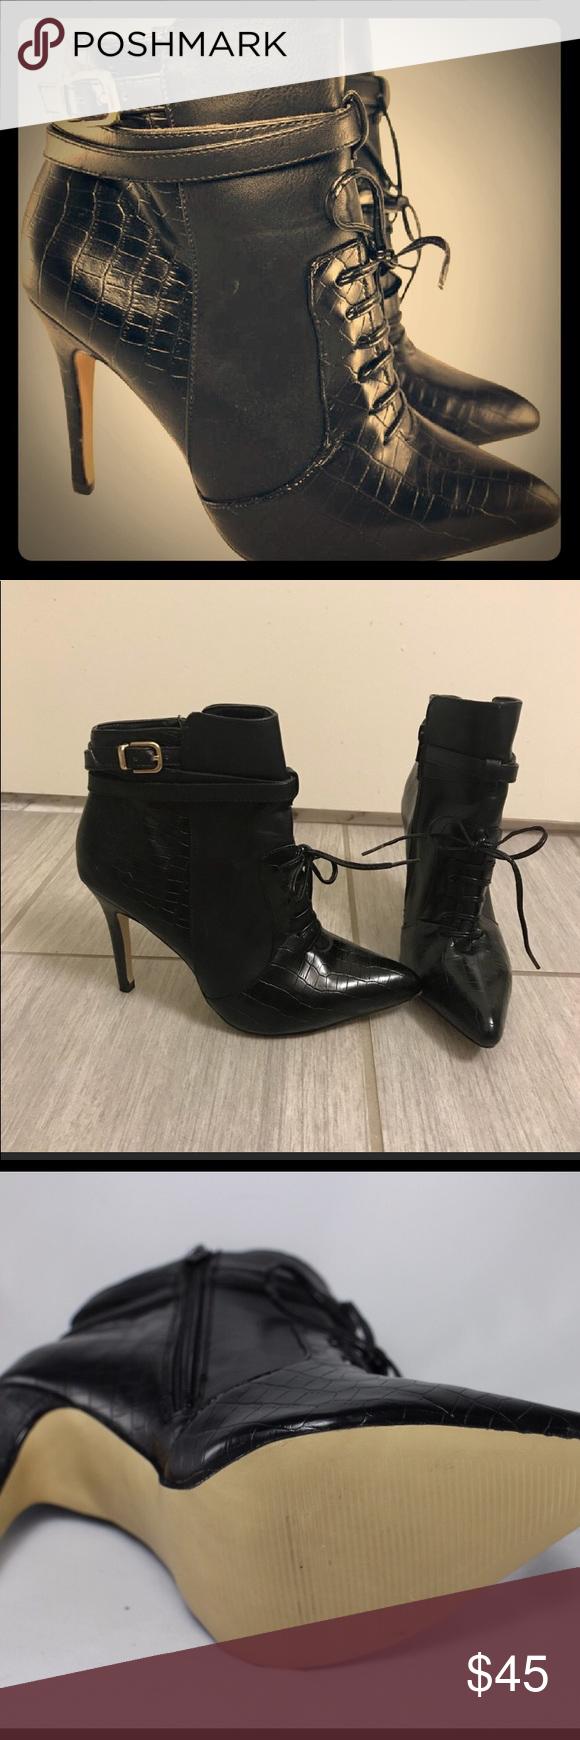 5cd63c96a36 Altuzarra croc boots ✨price drop today only✨ Super cute Never worn ...